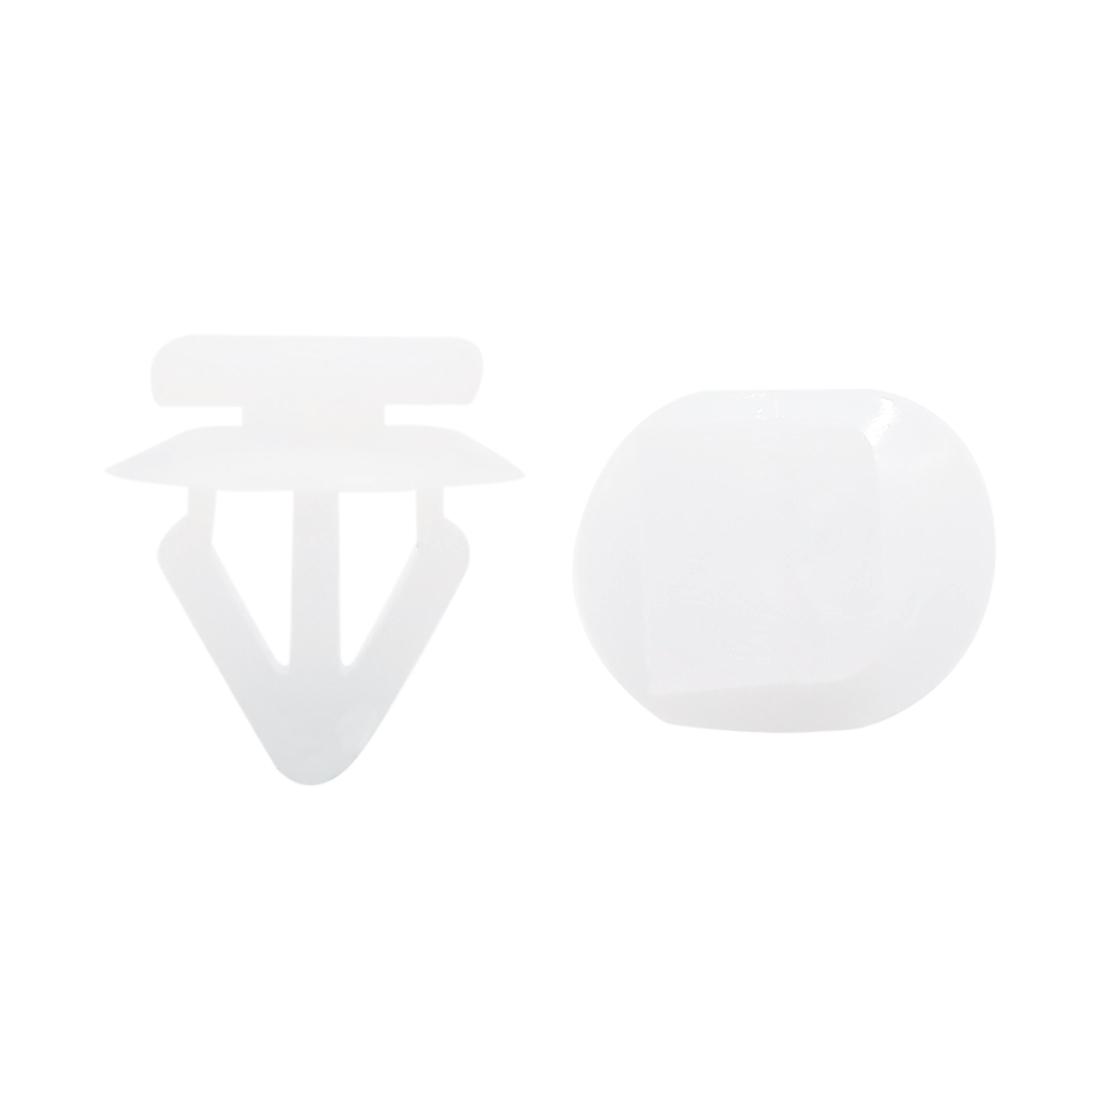 20Pcs 13mm Hole Plastic Rivets Fastener Push Type Clips White for Auto Car